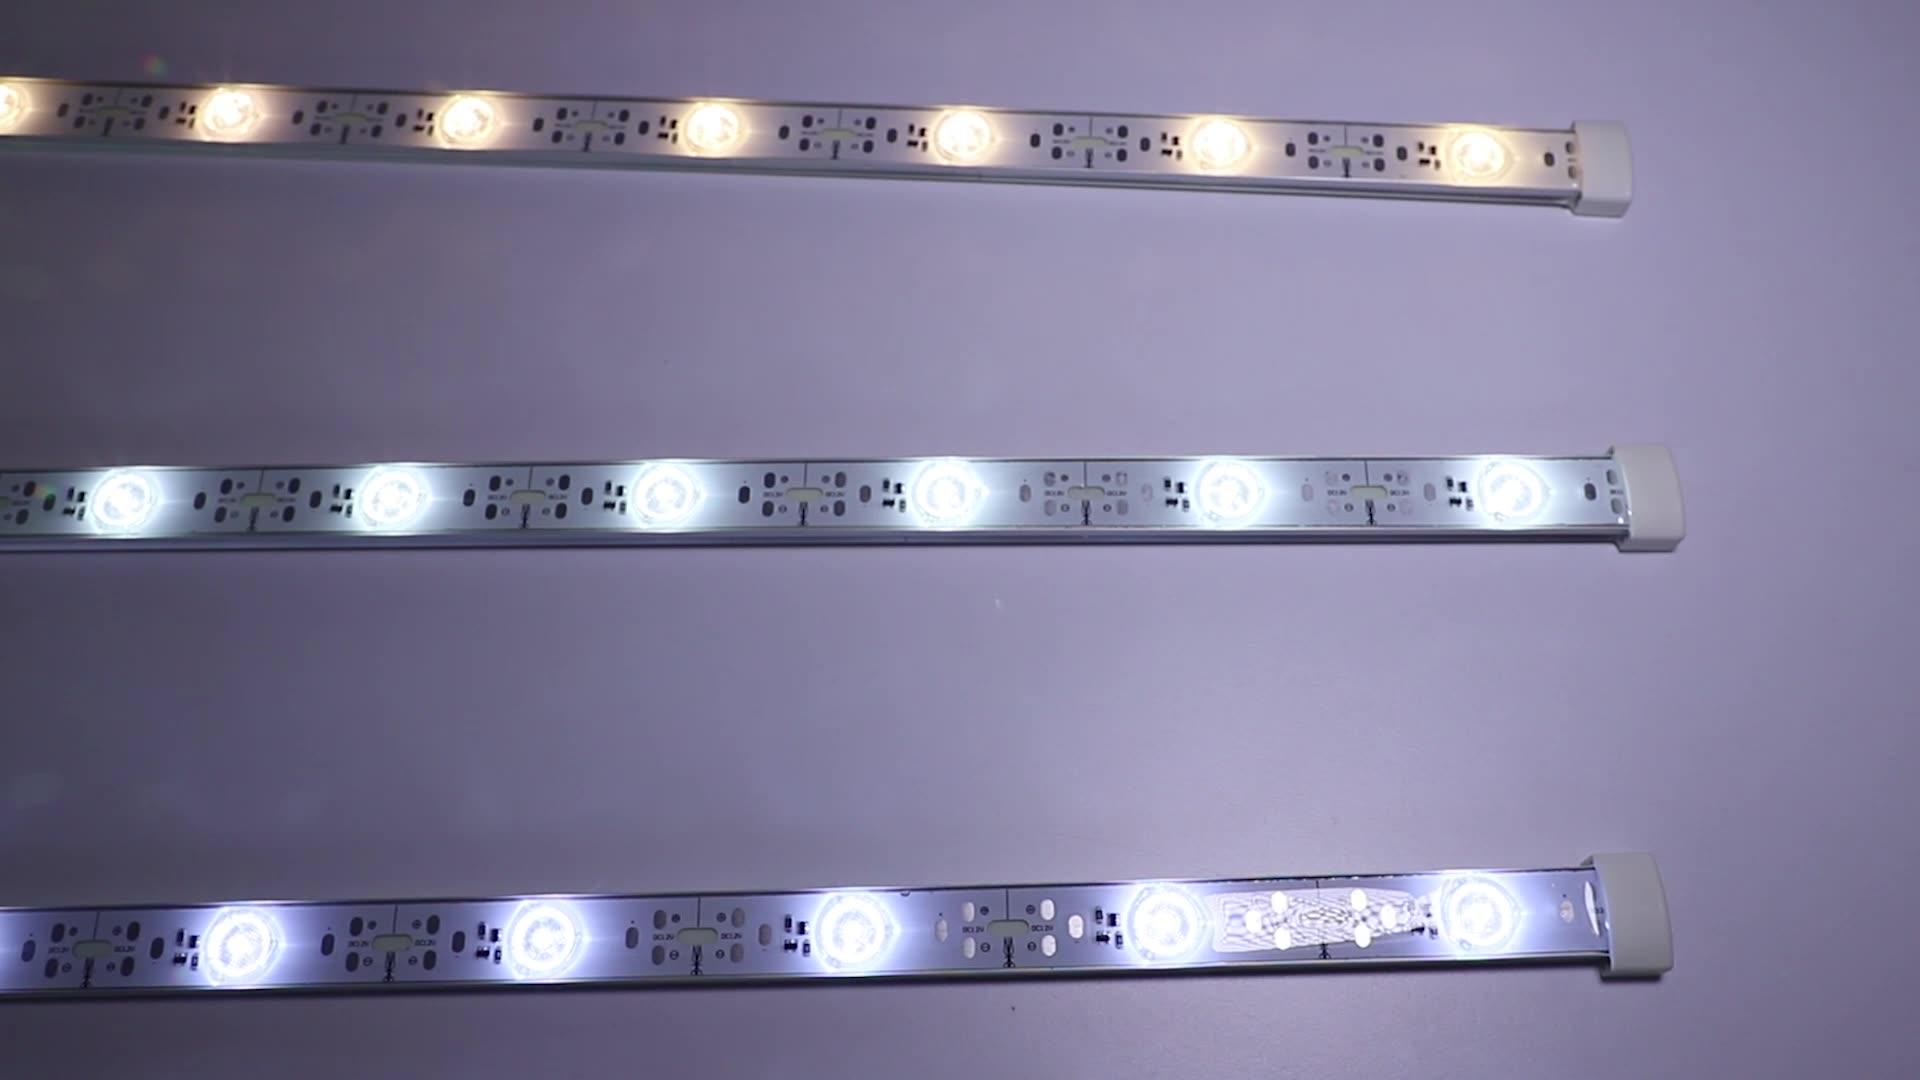 UL Back Lit Fabric Light Box Solution 3030 SMD LED Strip Backlight Waterproof LED Bar Backlight